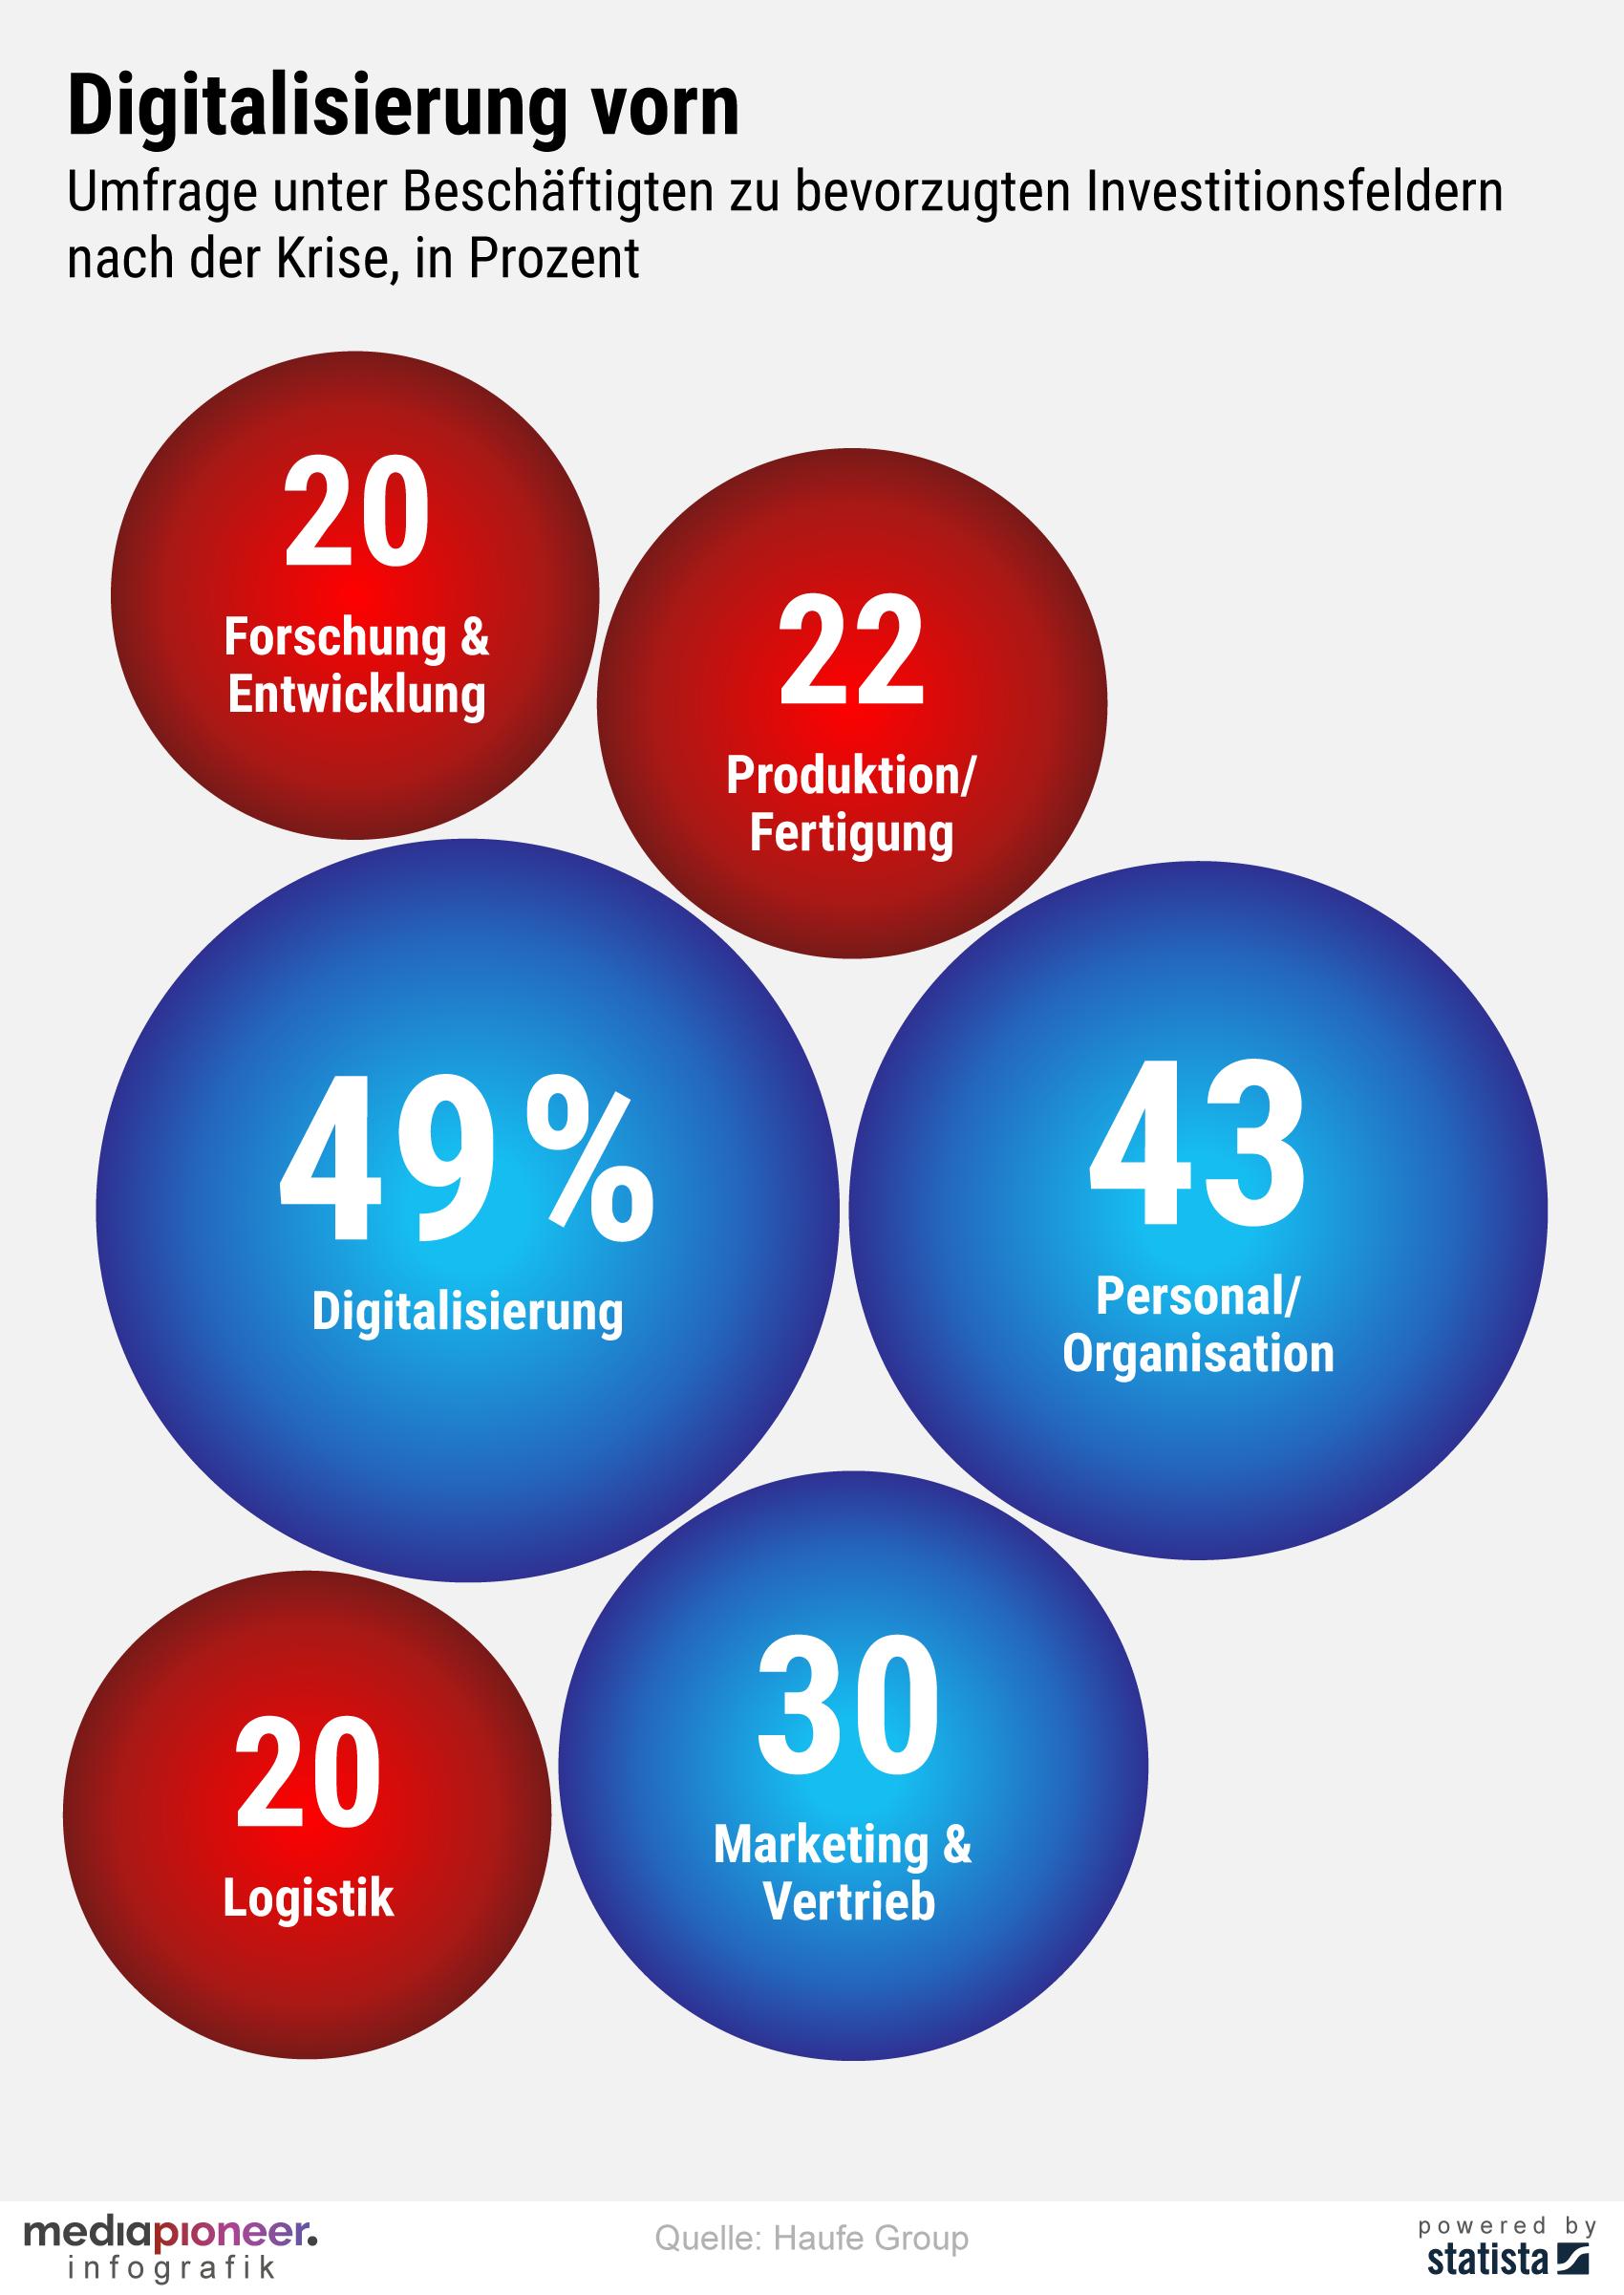 200519-infografik-media-pioneer-digitalisierung-vorn